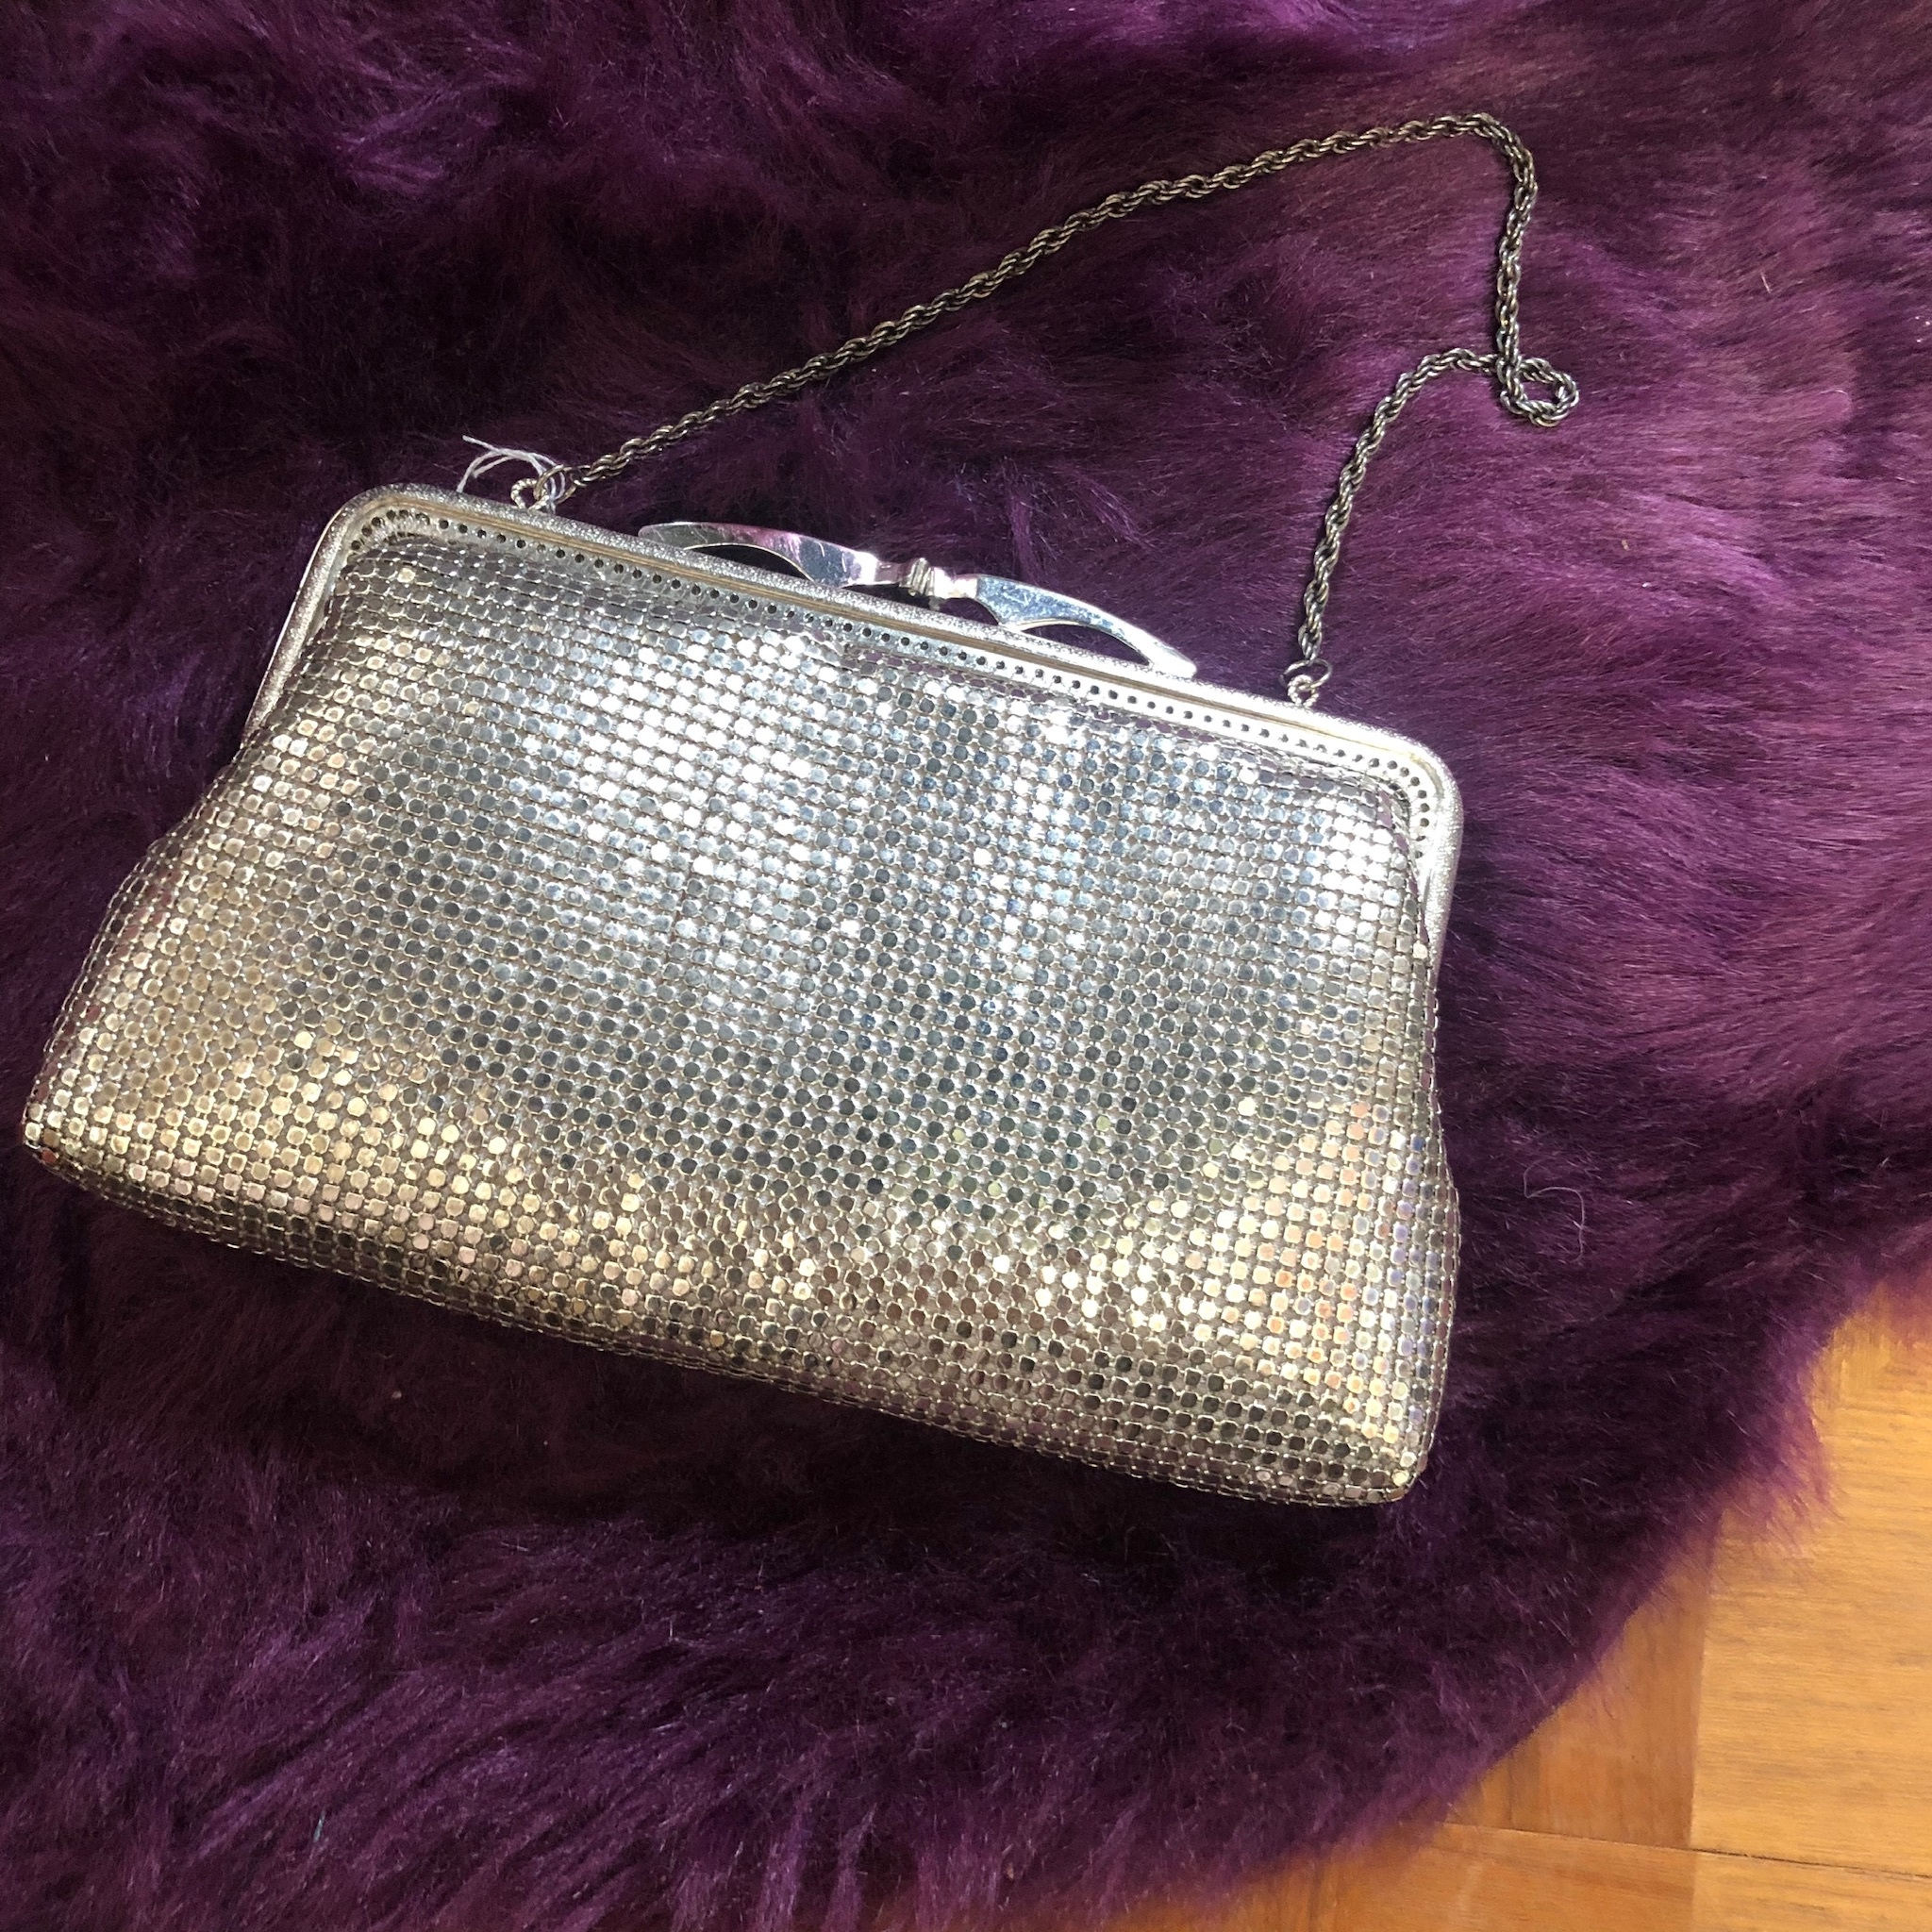 spangled silver handbag